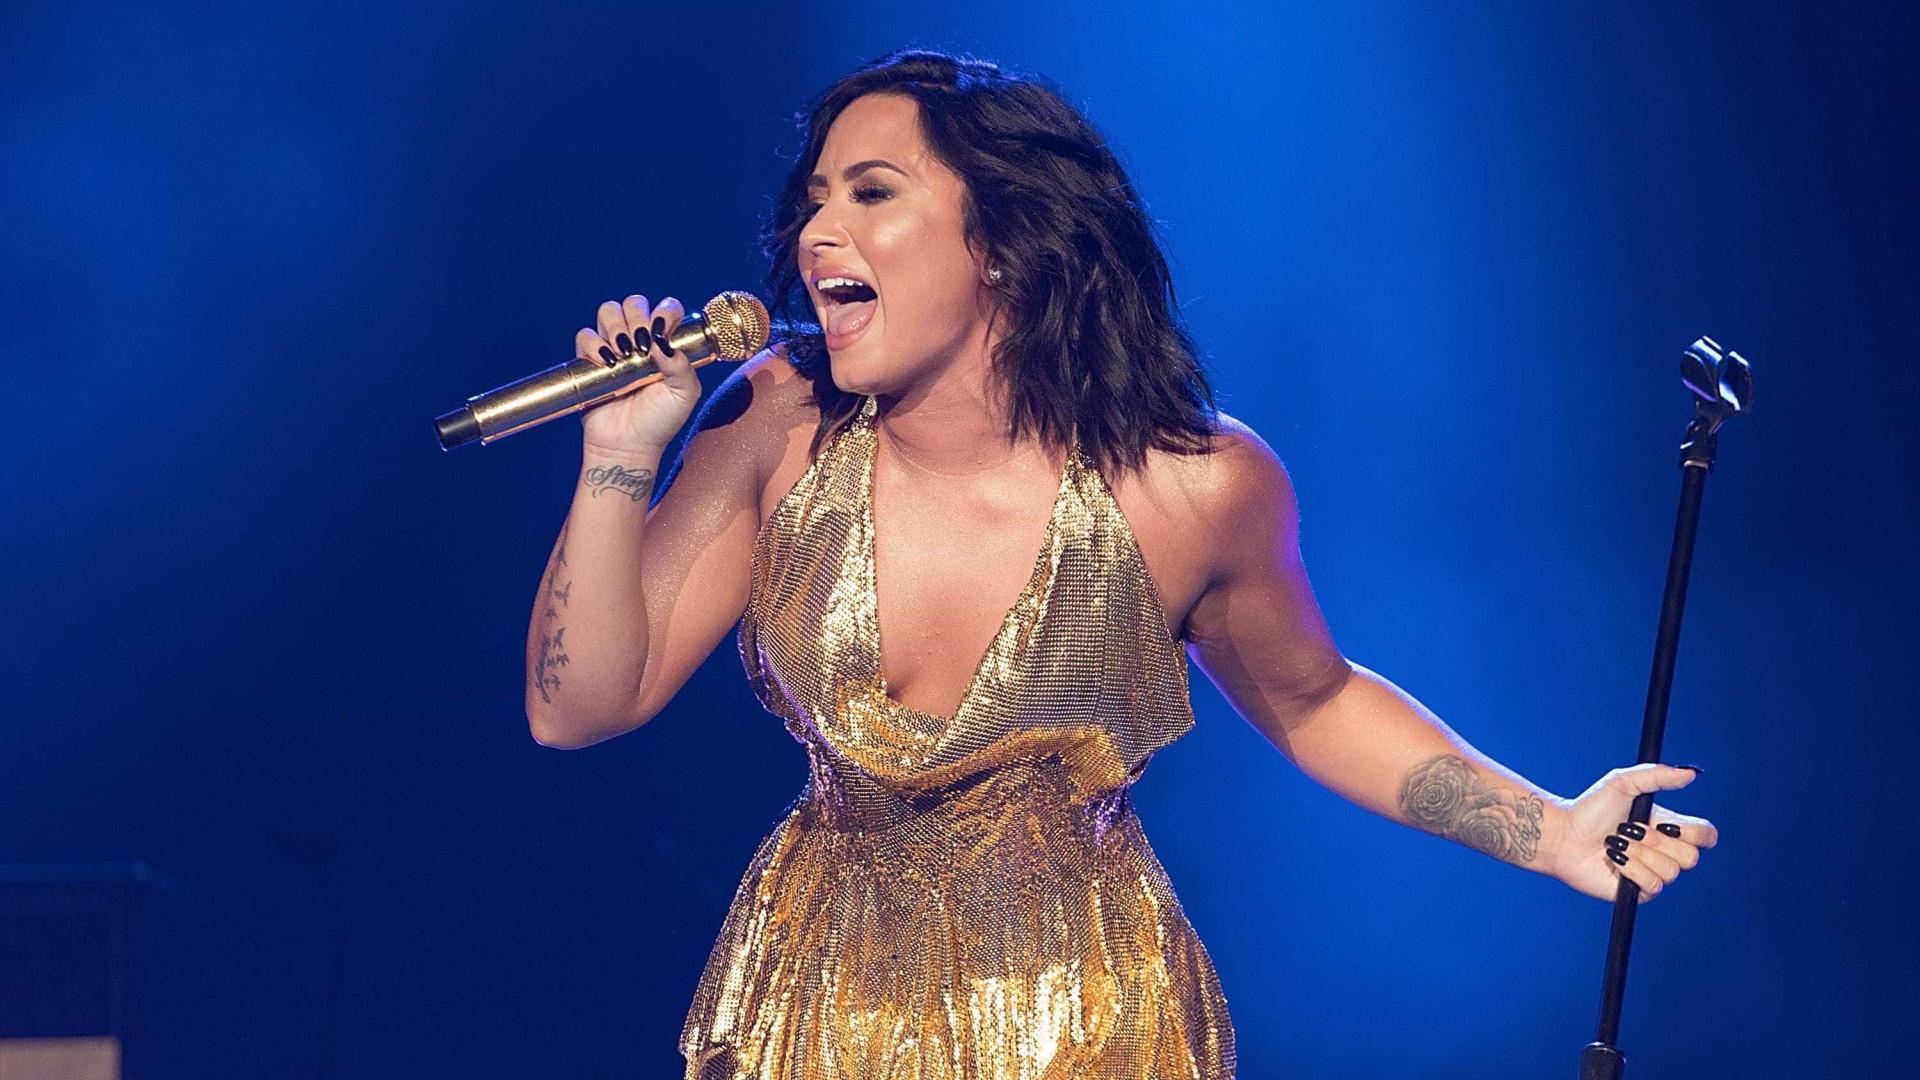 Demi Lovato recusa-se a dar autógrafo